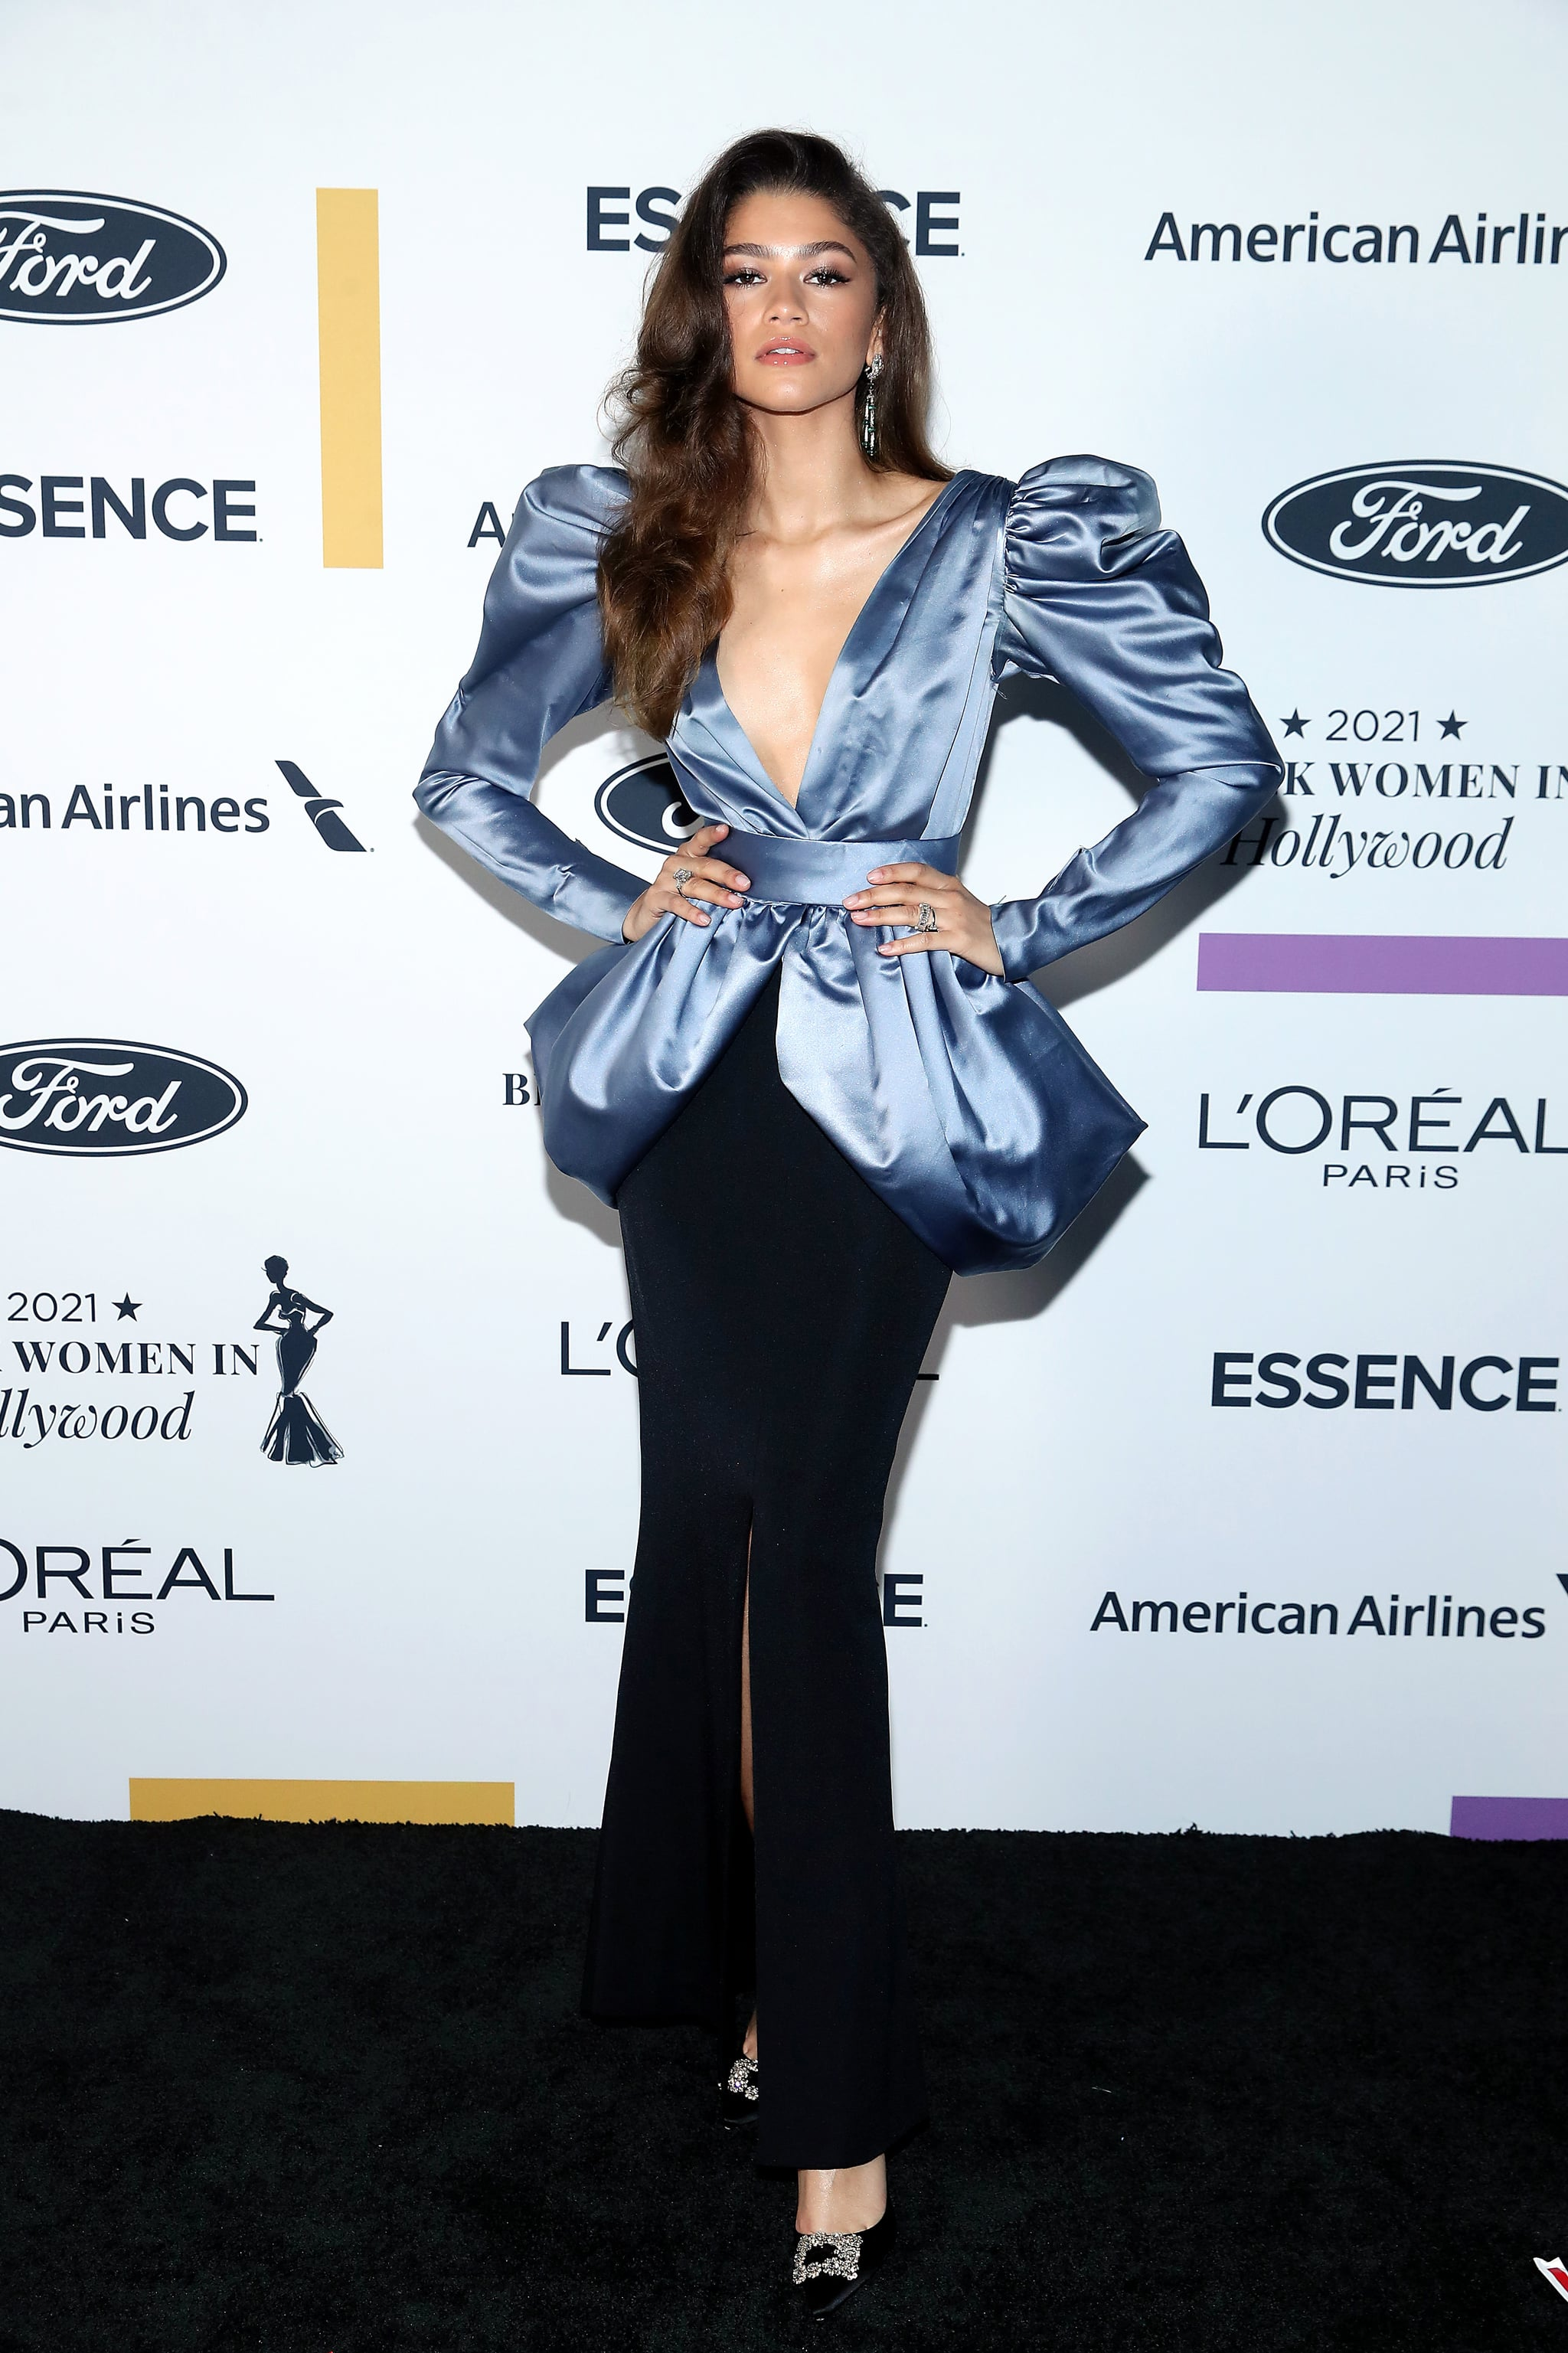 Zendaya's Outfit at Essence Black Women in Hollywood Awards | POPSUGAR Fashion